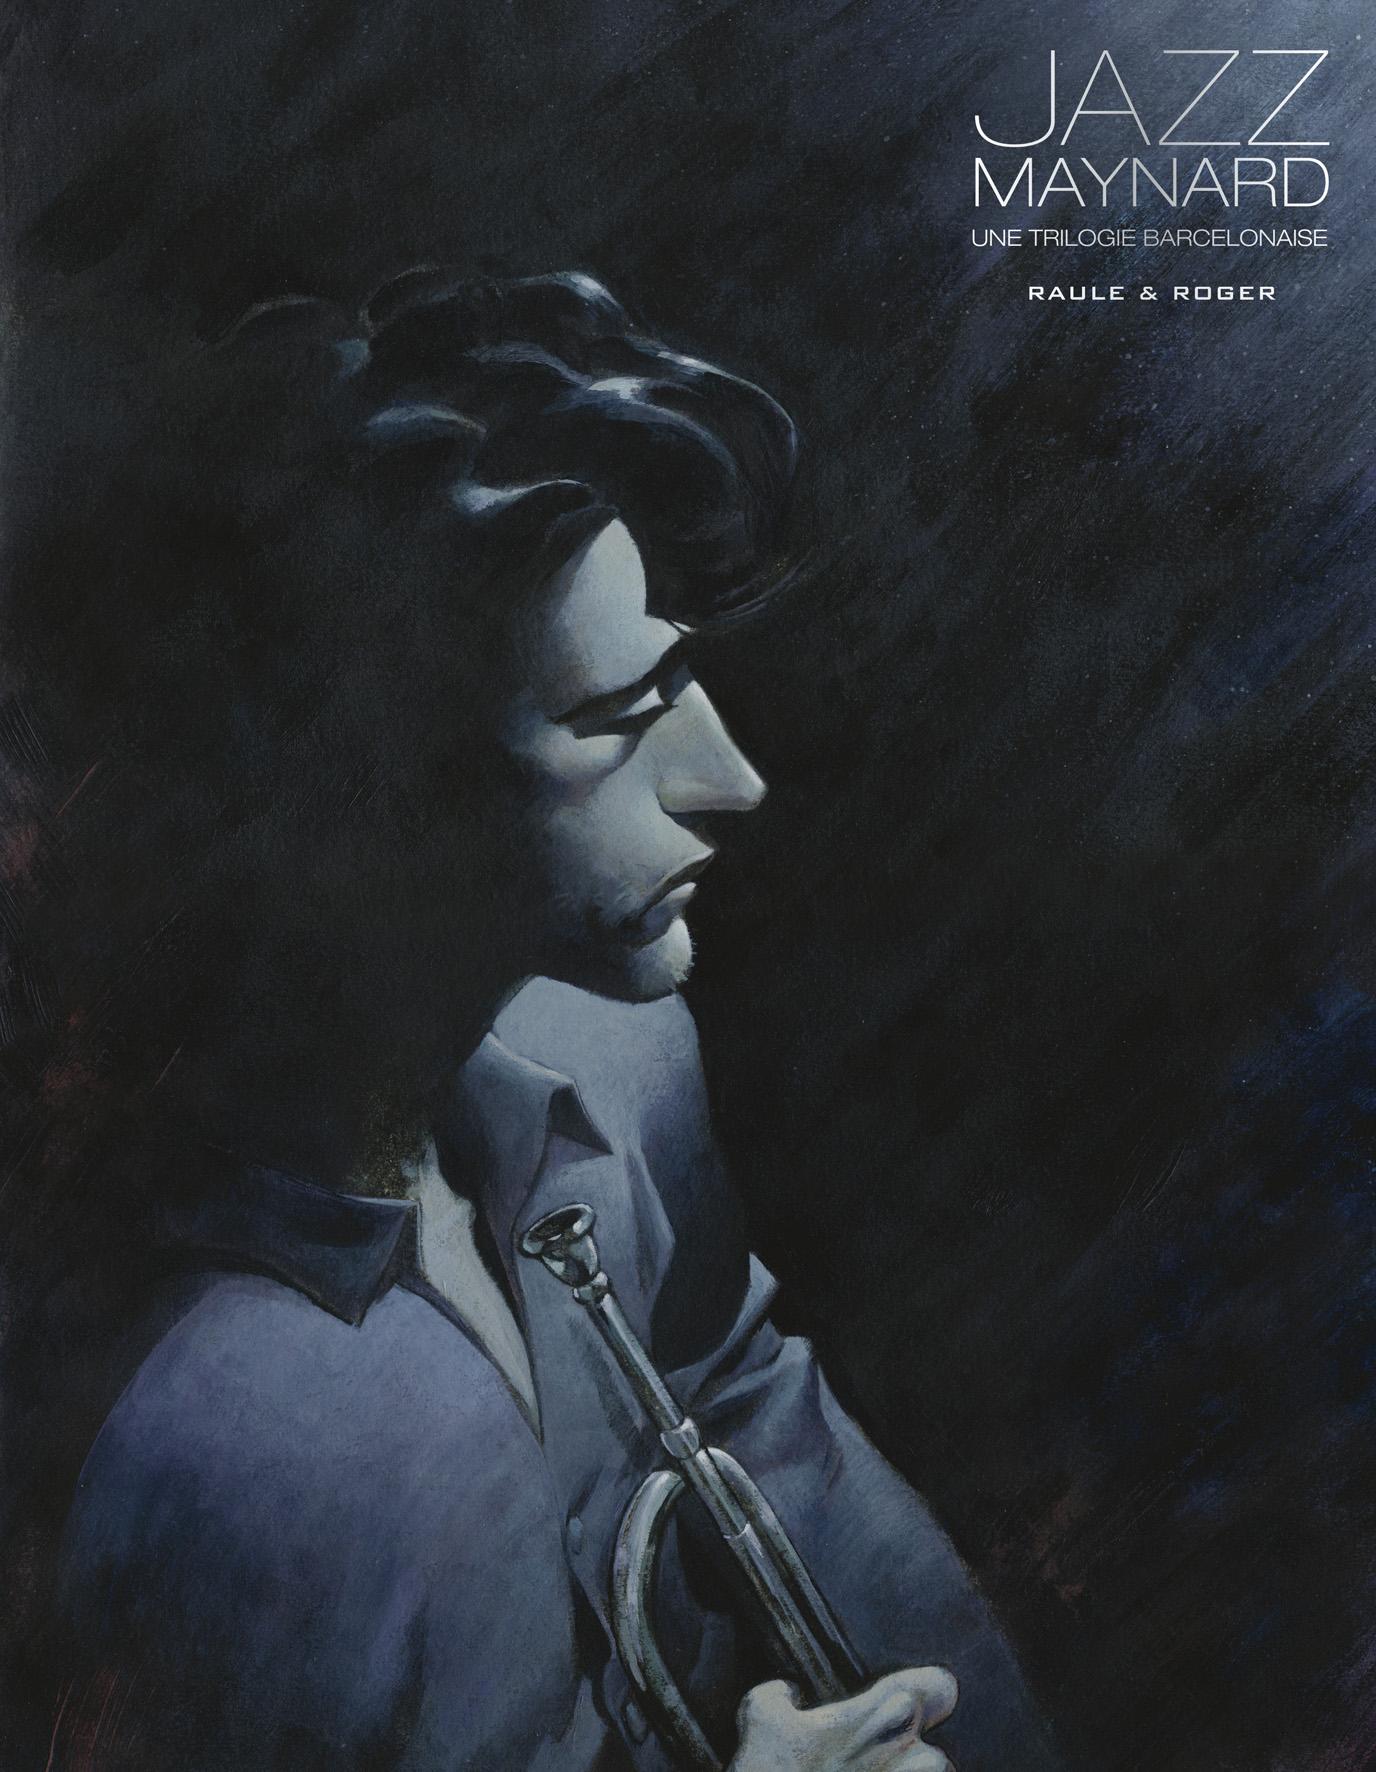 Jazz Maynard 1 - Une trilogie barcelonaise